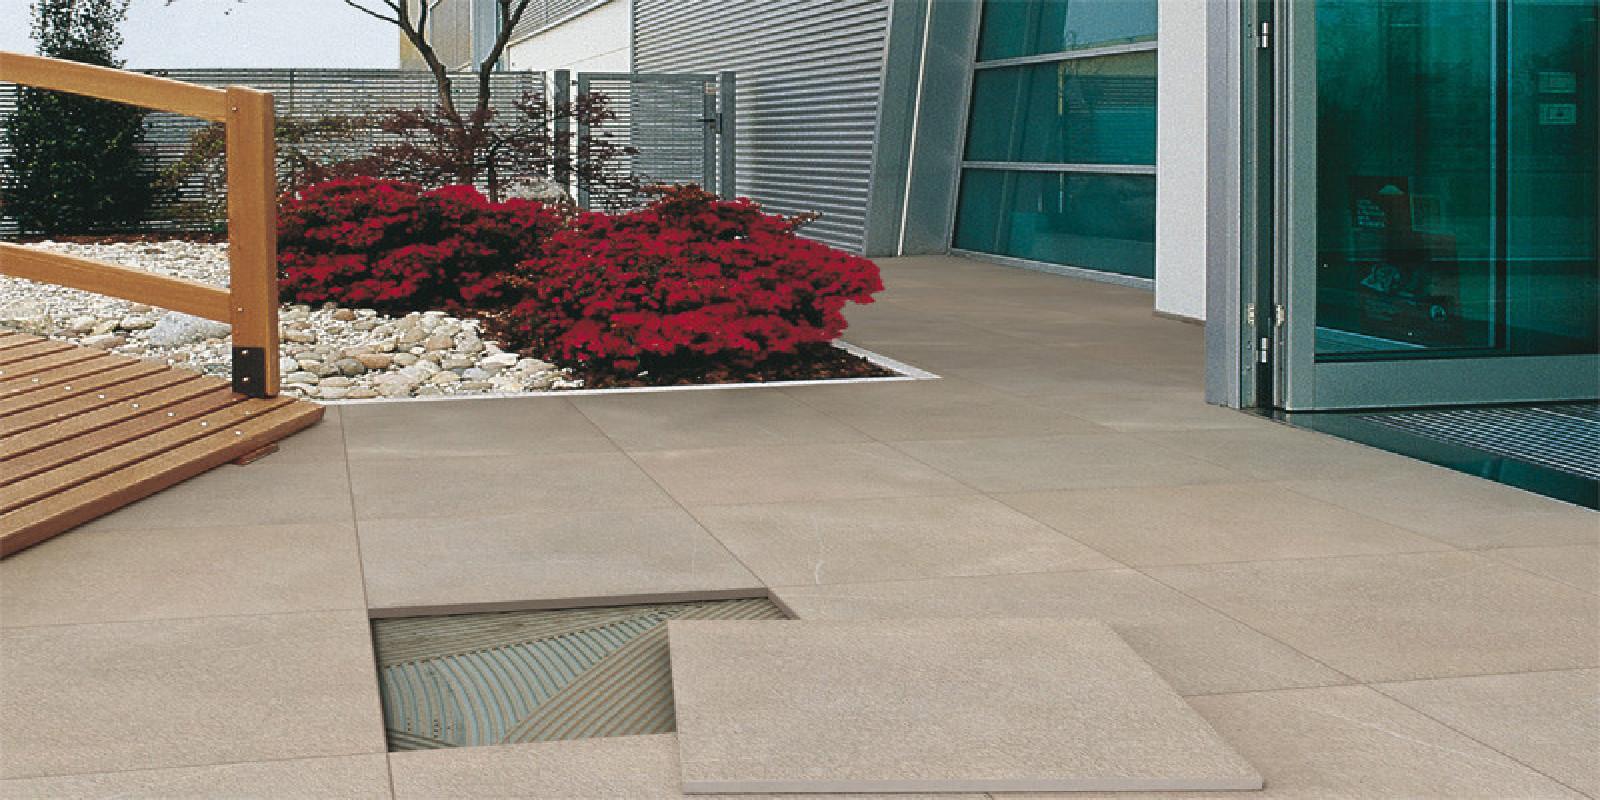 Pavimenti per esterni piastrelle sottili posa su pavimenti esistenti - Incollare piastrelle su piastrelle ...